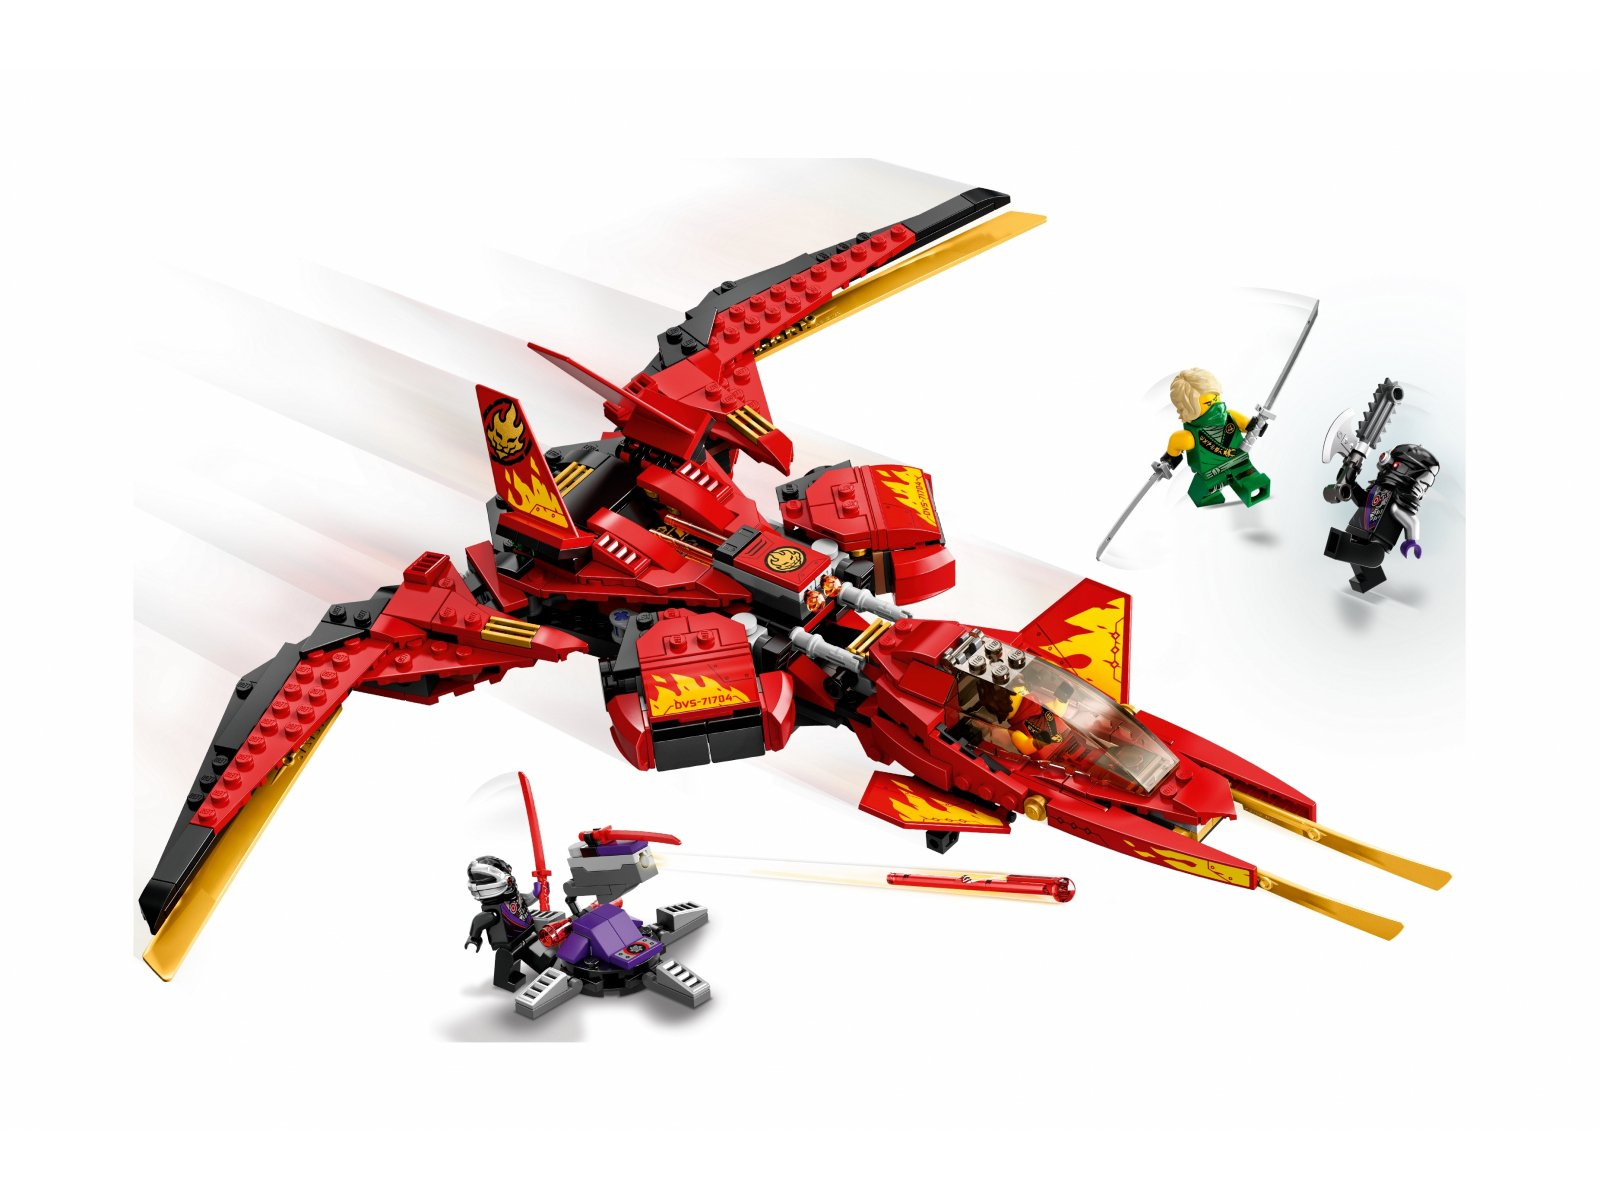 LEGO 71704 Ninjago Pojazd bojowy Kaia